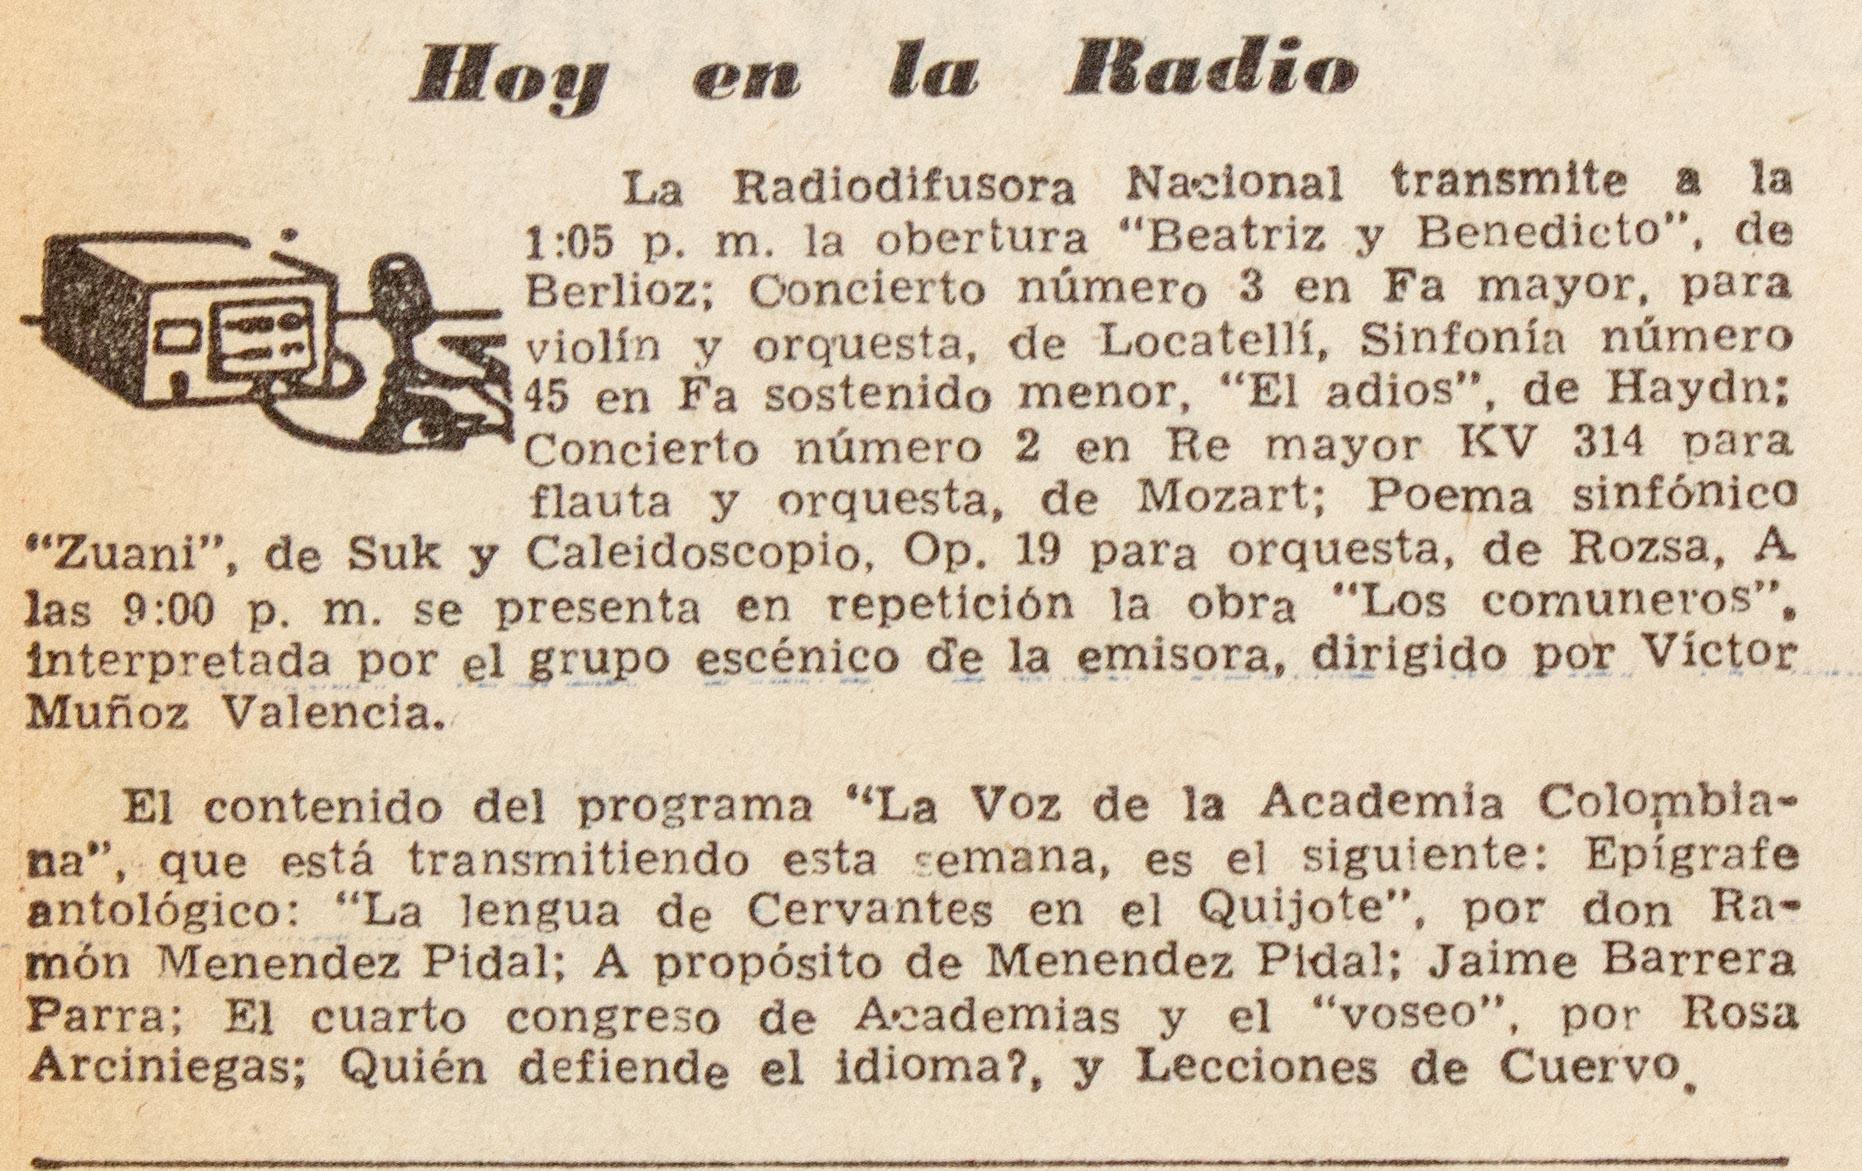 Revista Estampa, 4 de febrero de 1965